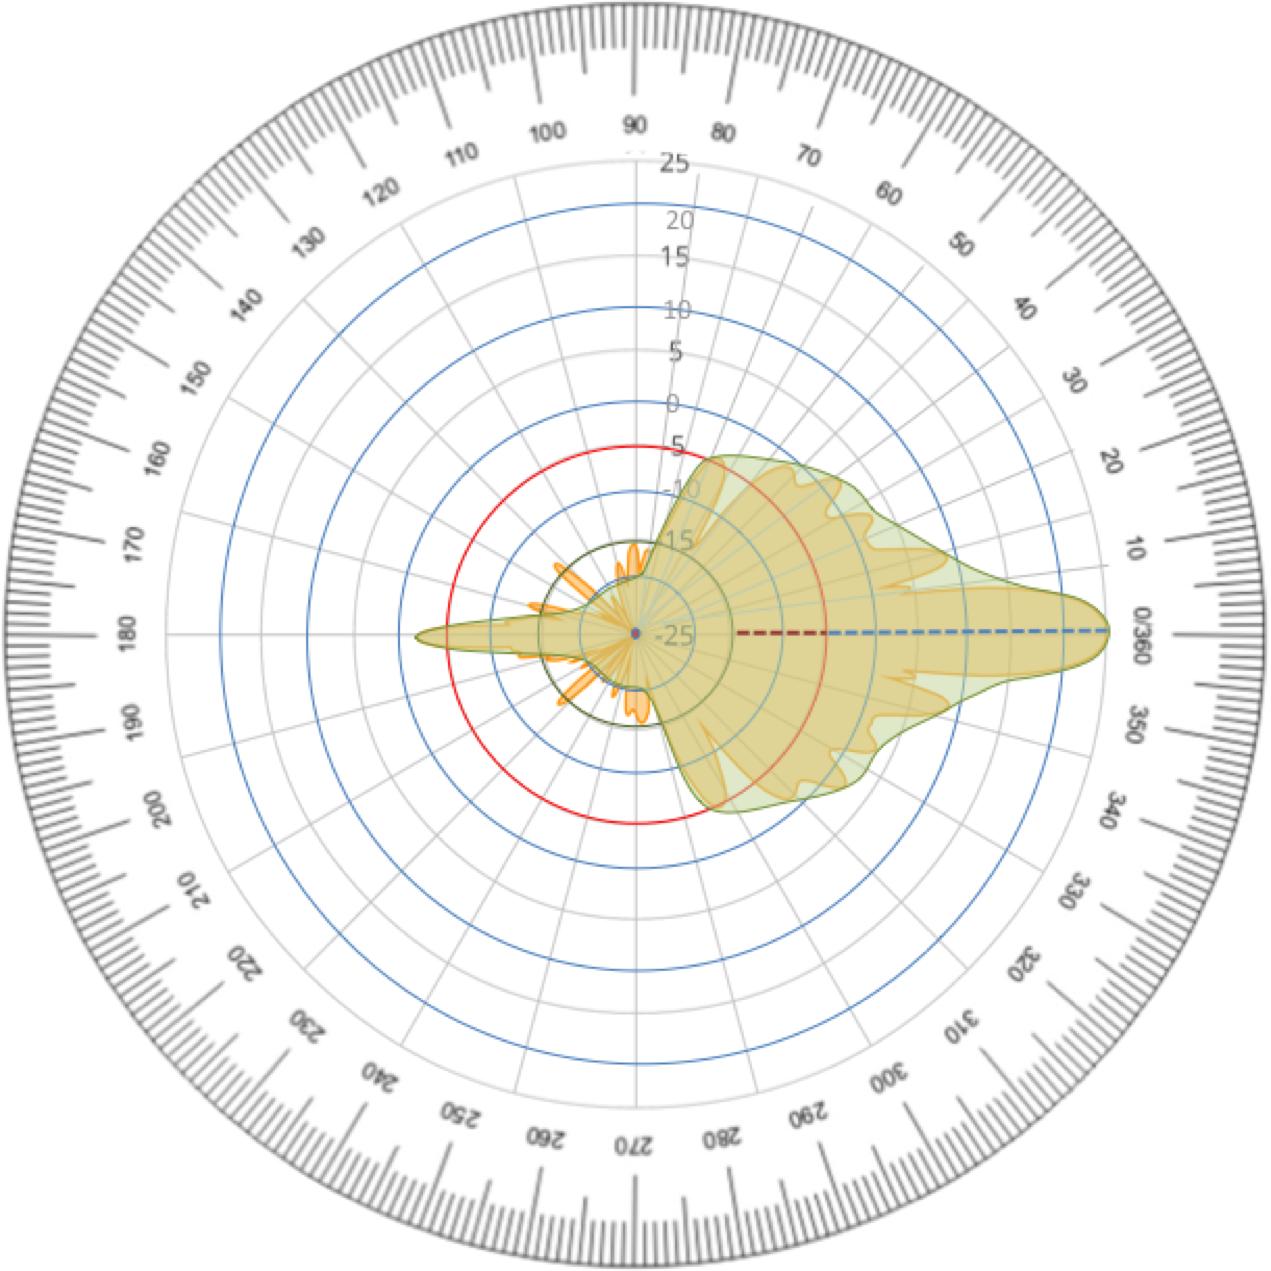 tdma-whitepaper-Figure-12.png